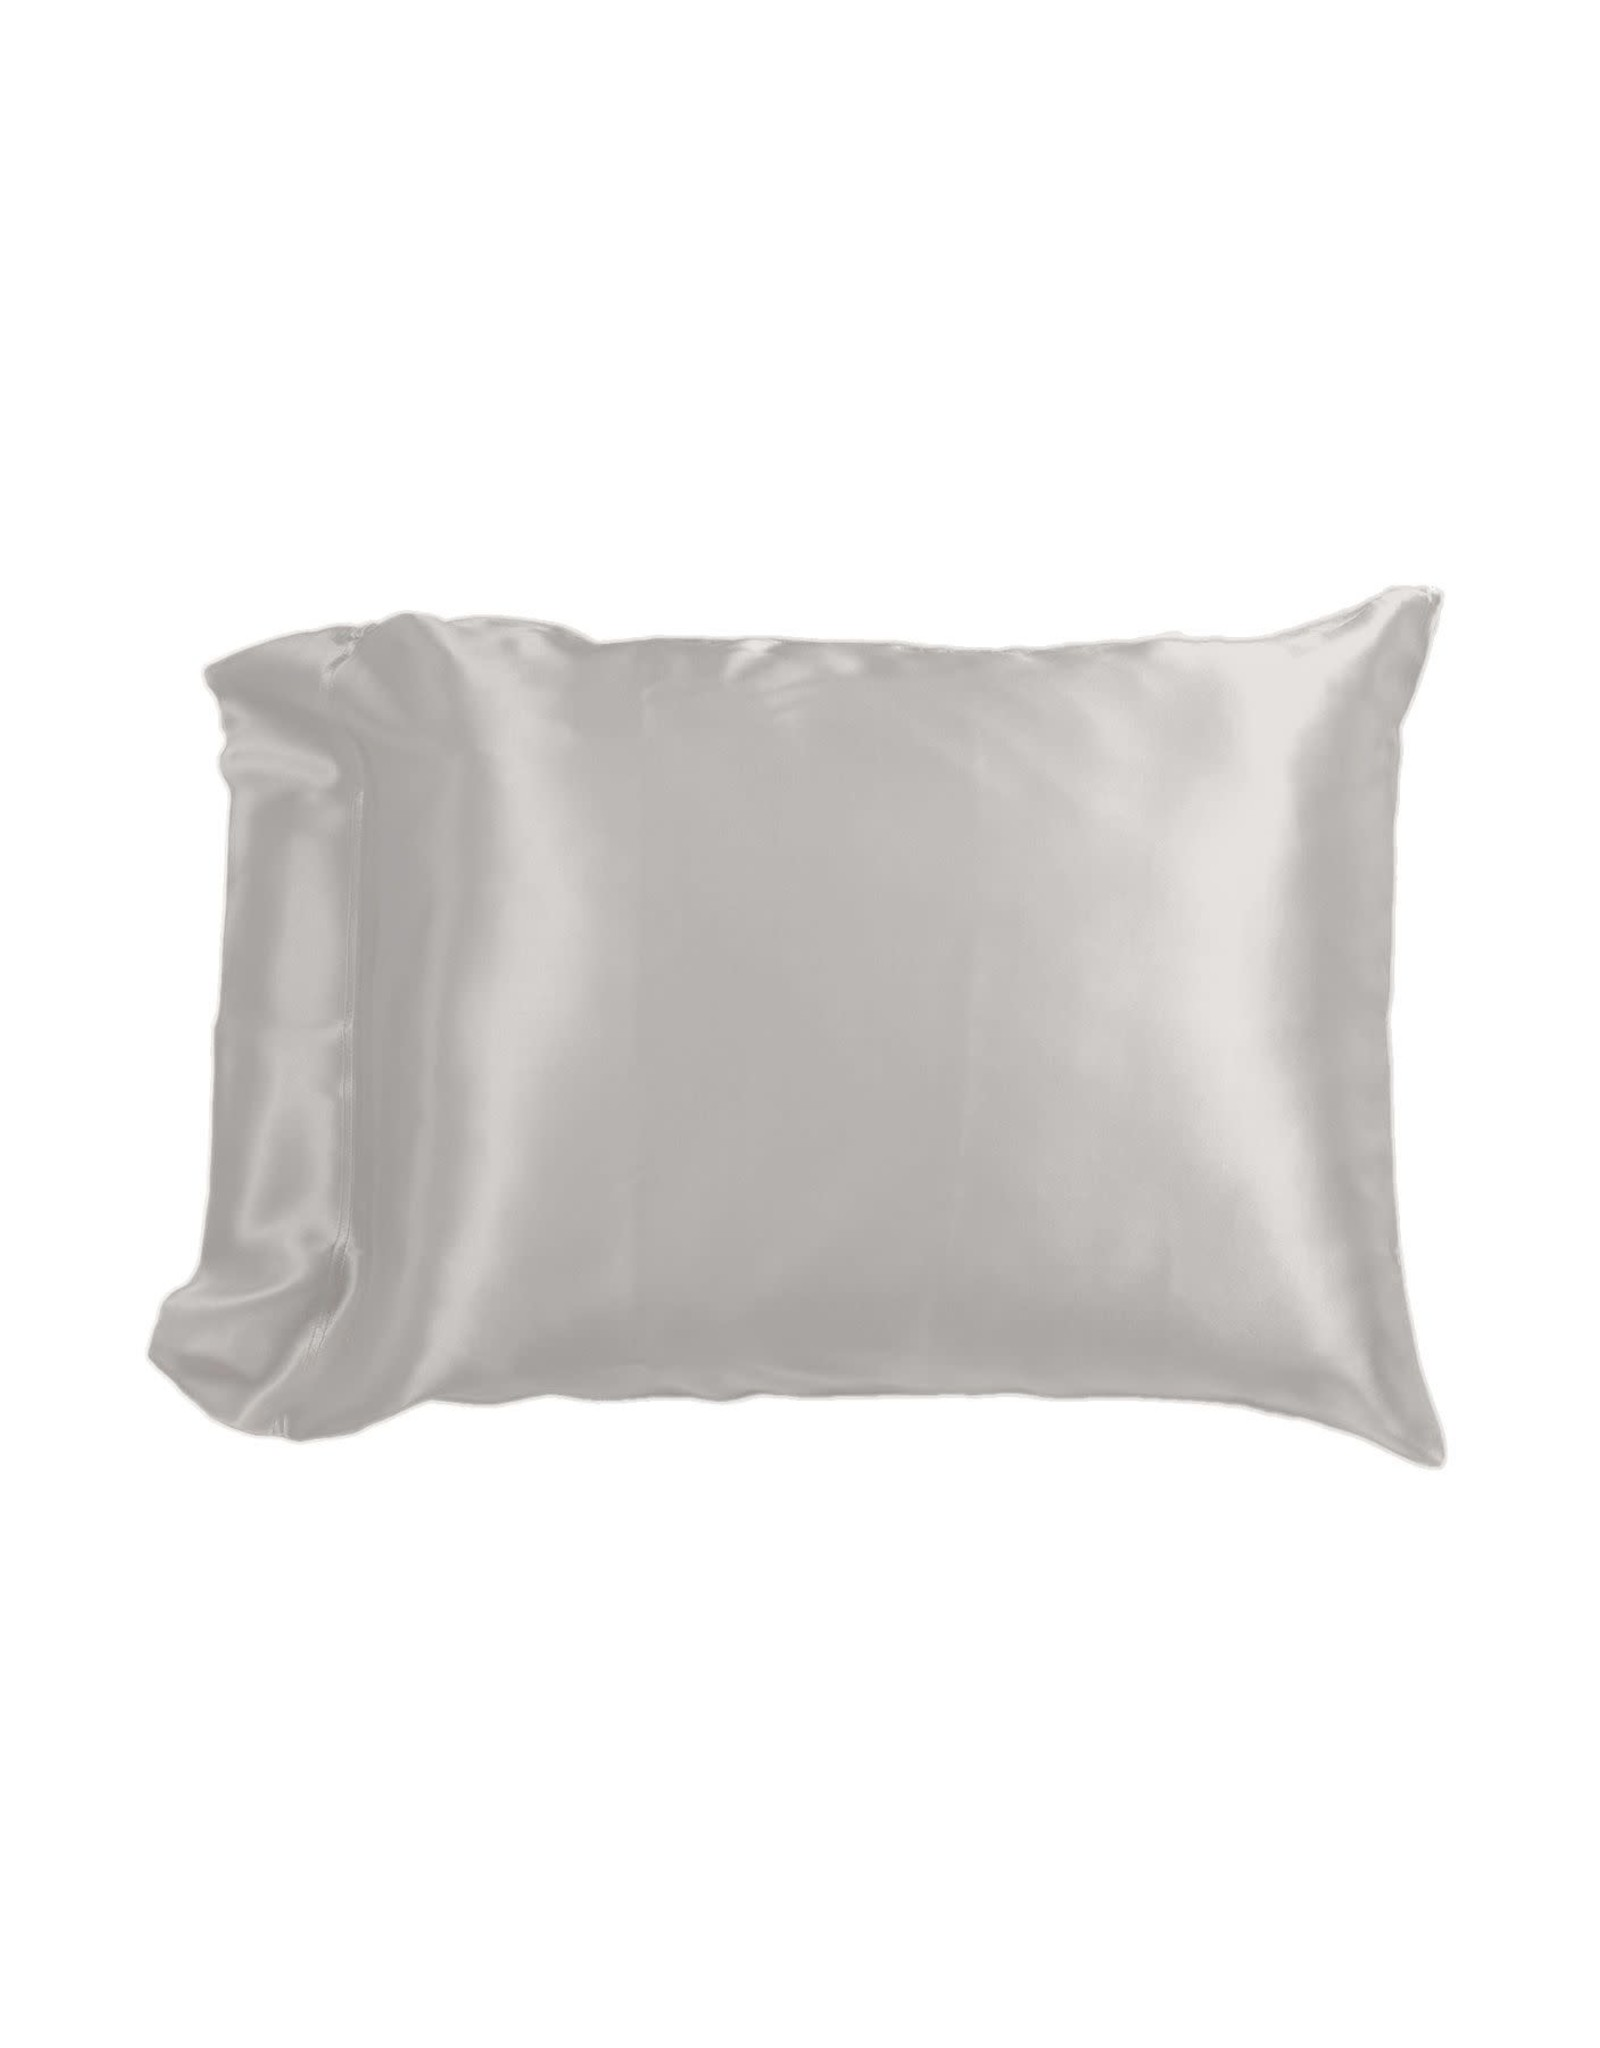 Pillowcases (pair) Silken Solid